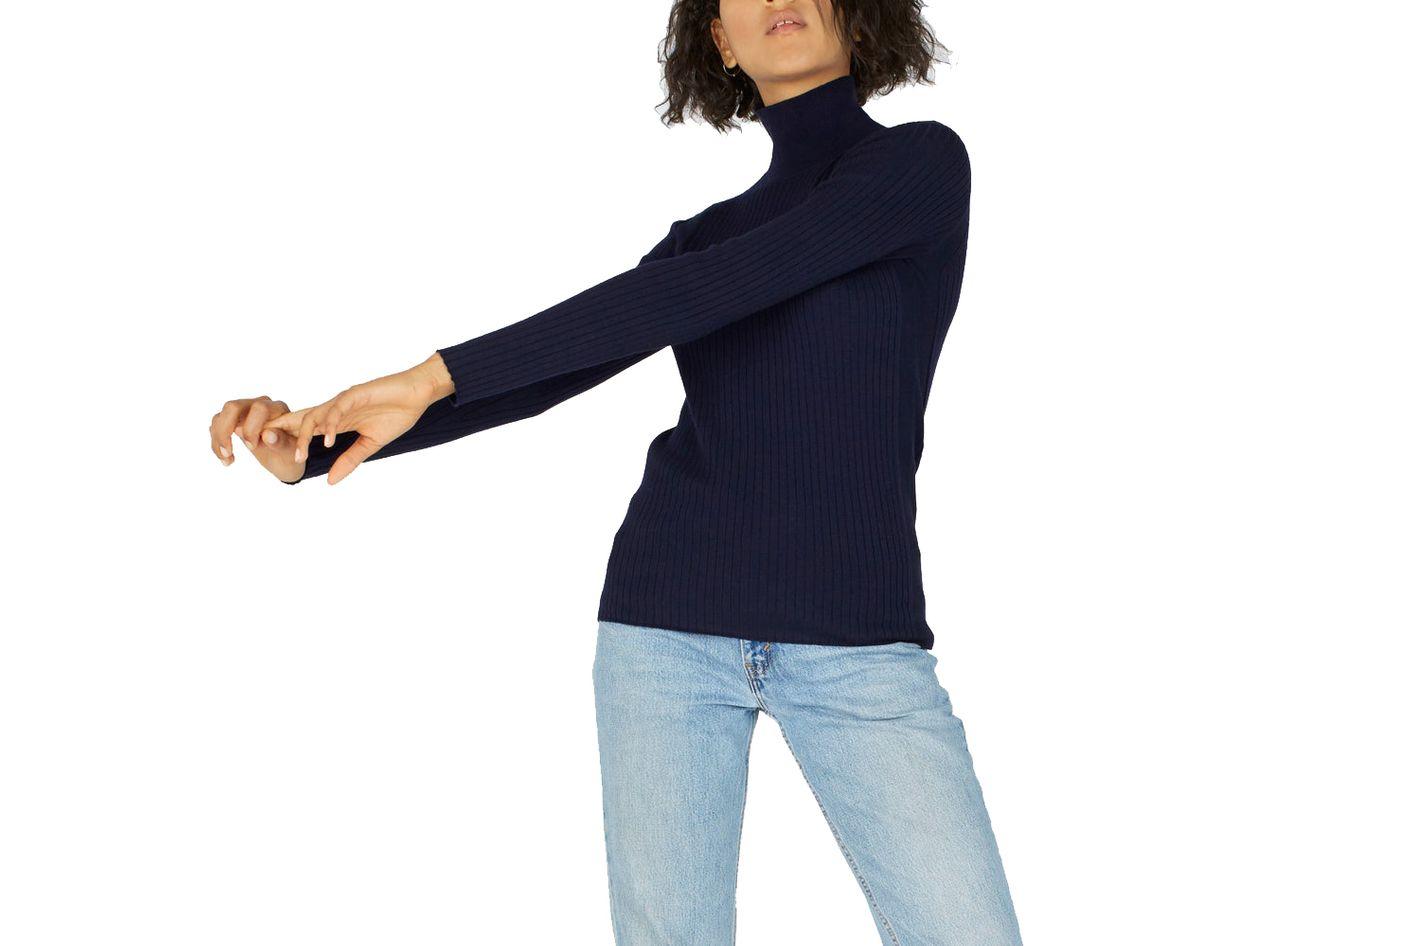 Everlane Luxe Wool Ribbed Turtleneck